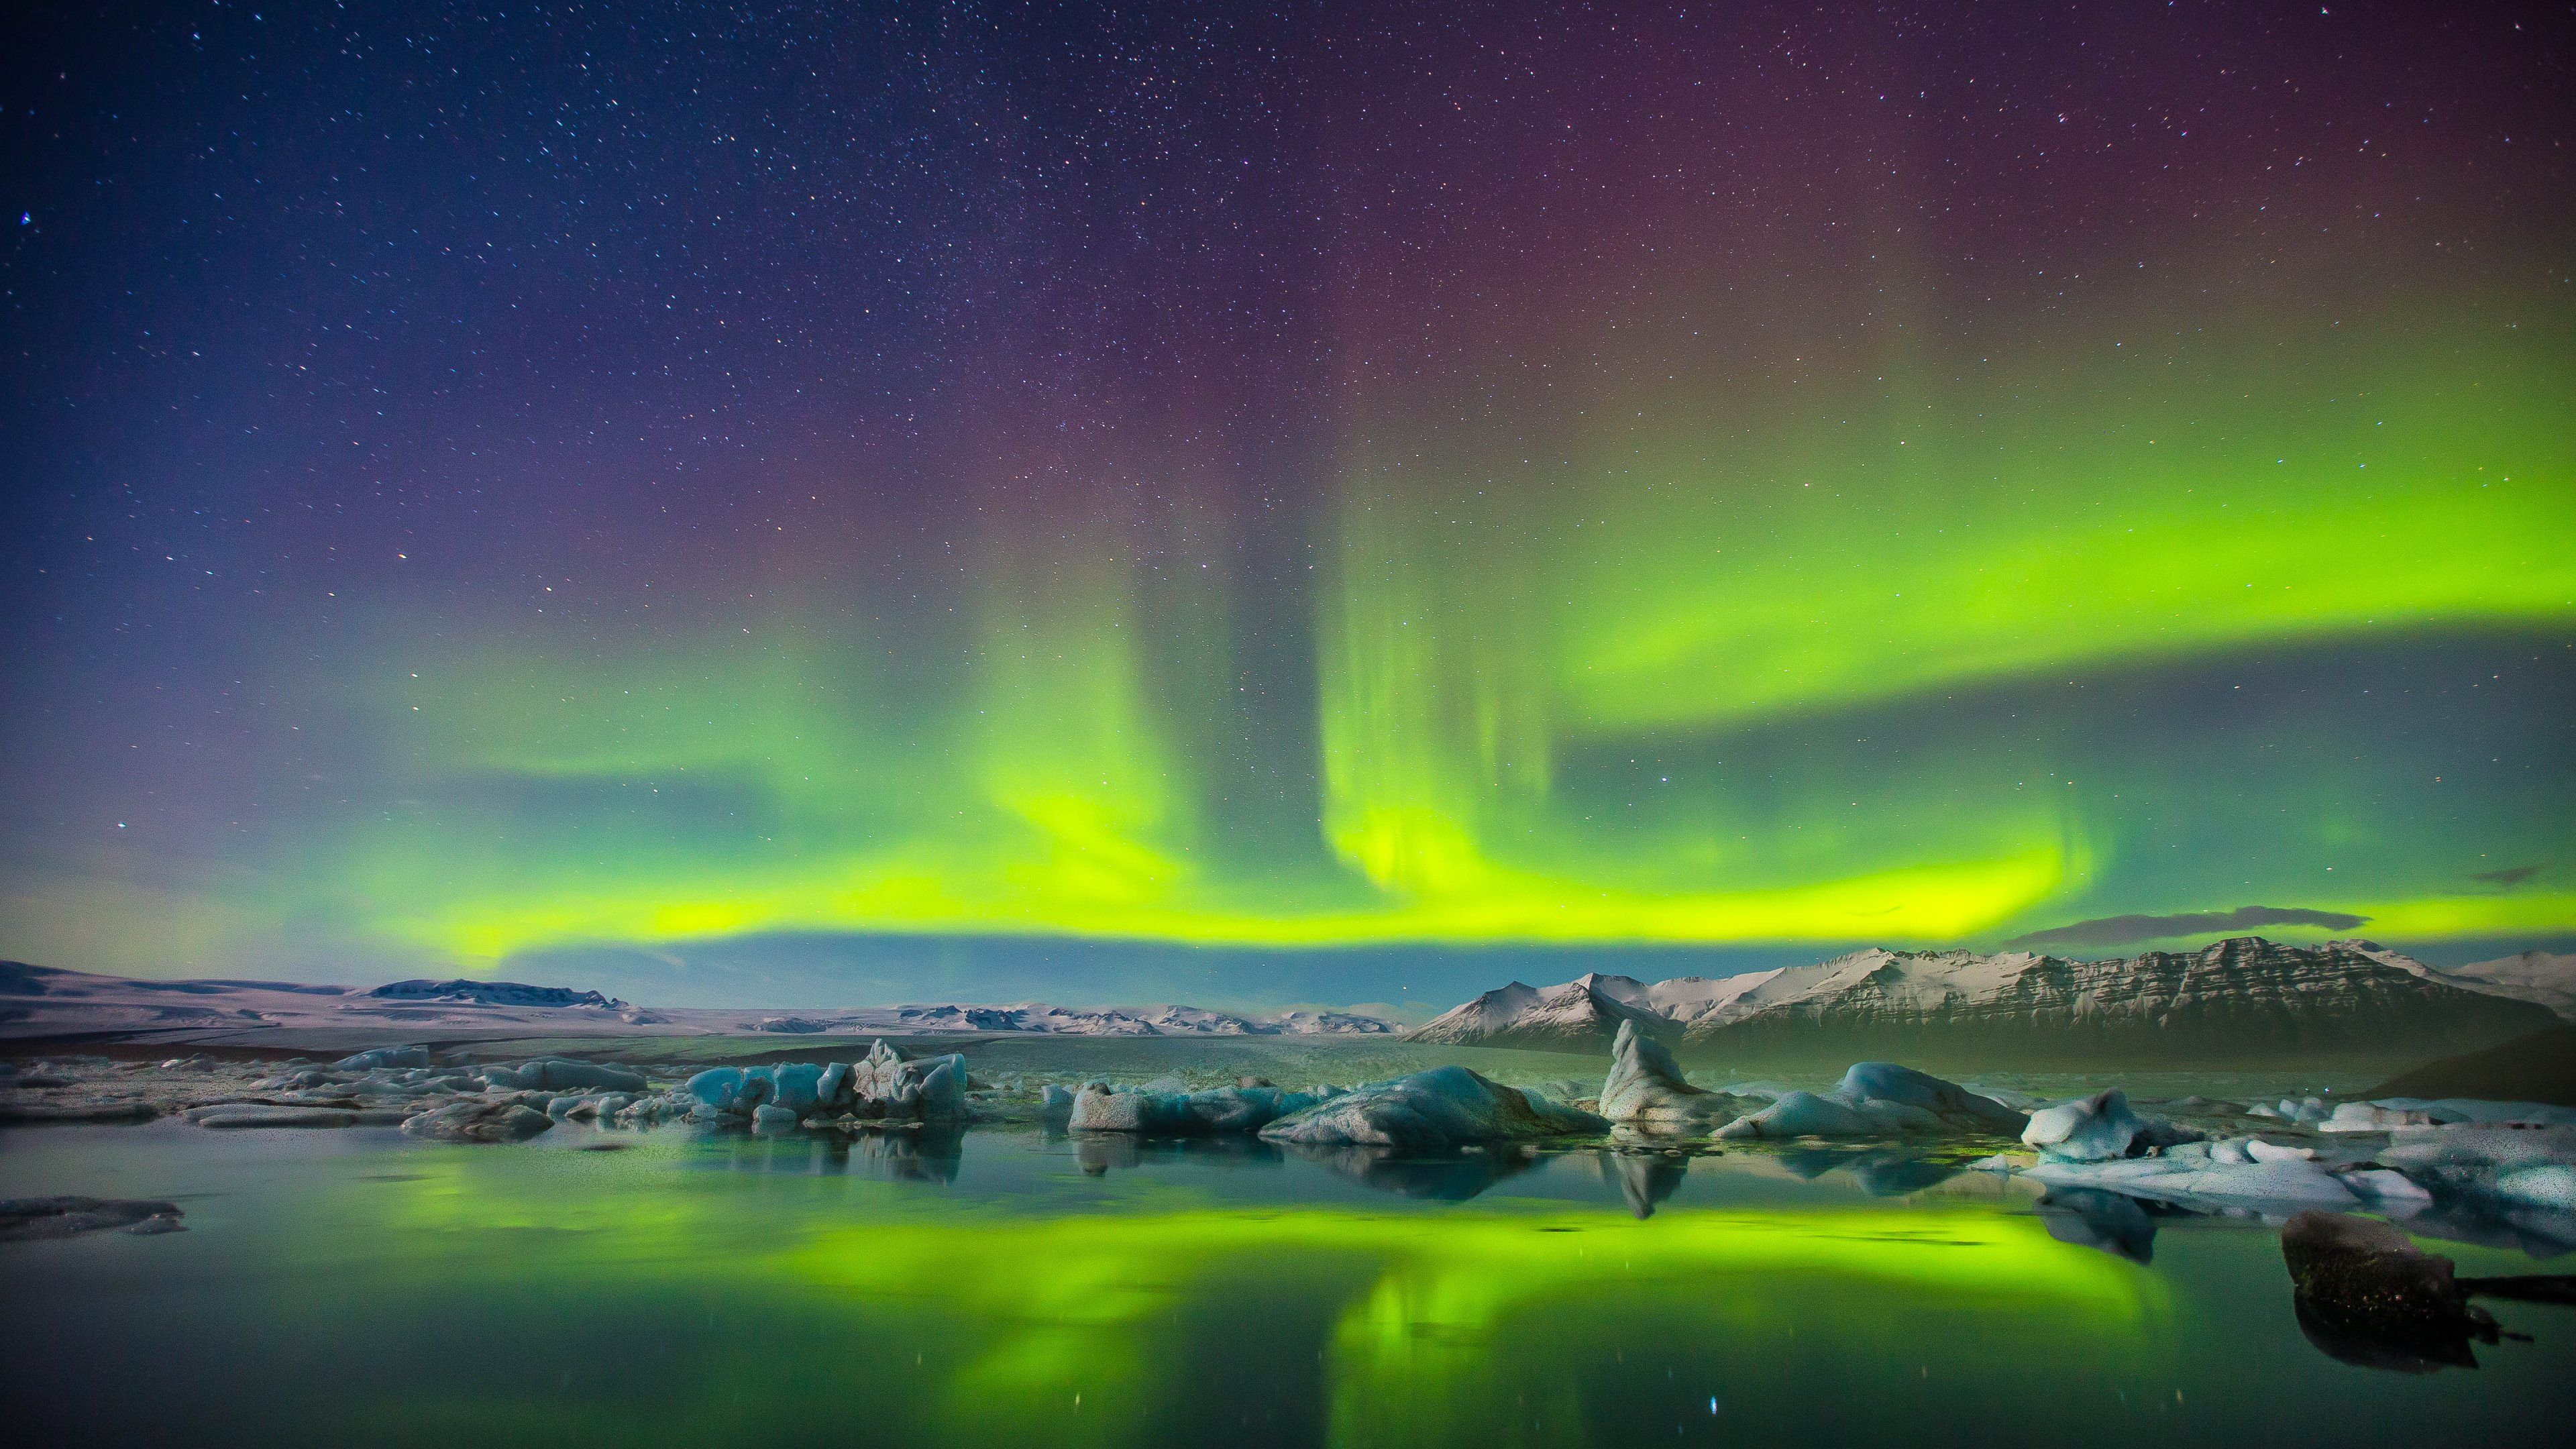 4k Hd Wallpaper In 2020 Northern Lights Wallpaper Northern Lights Aurora Borealis Northern Lights